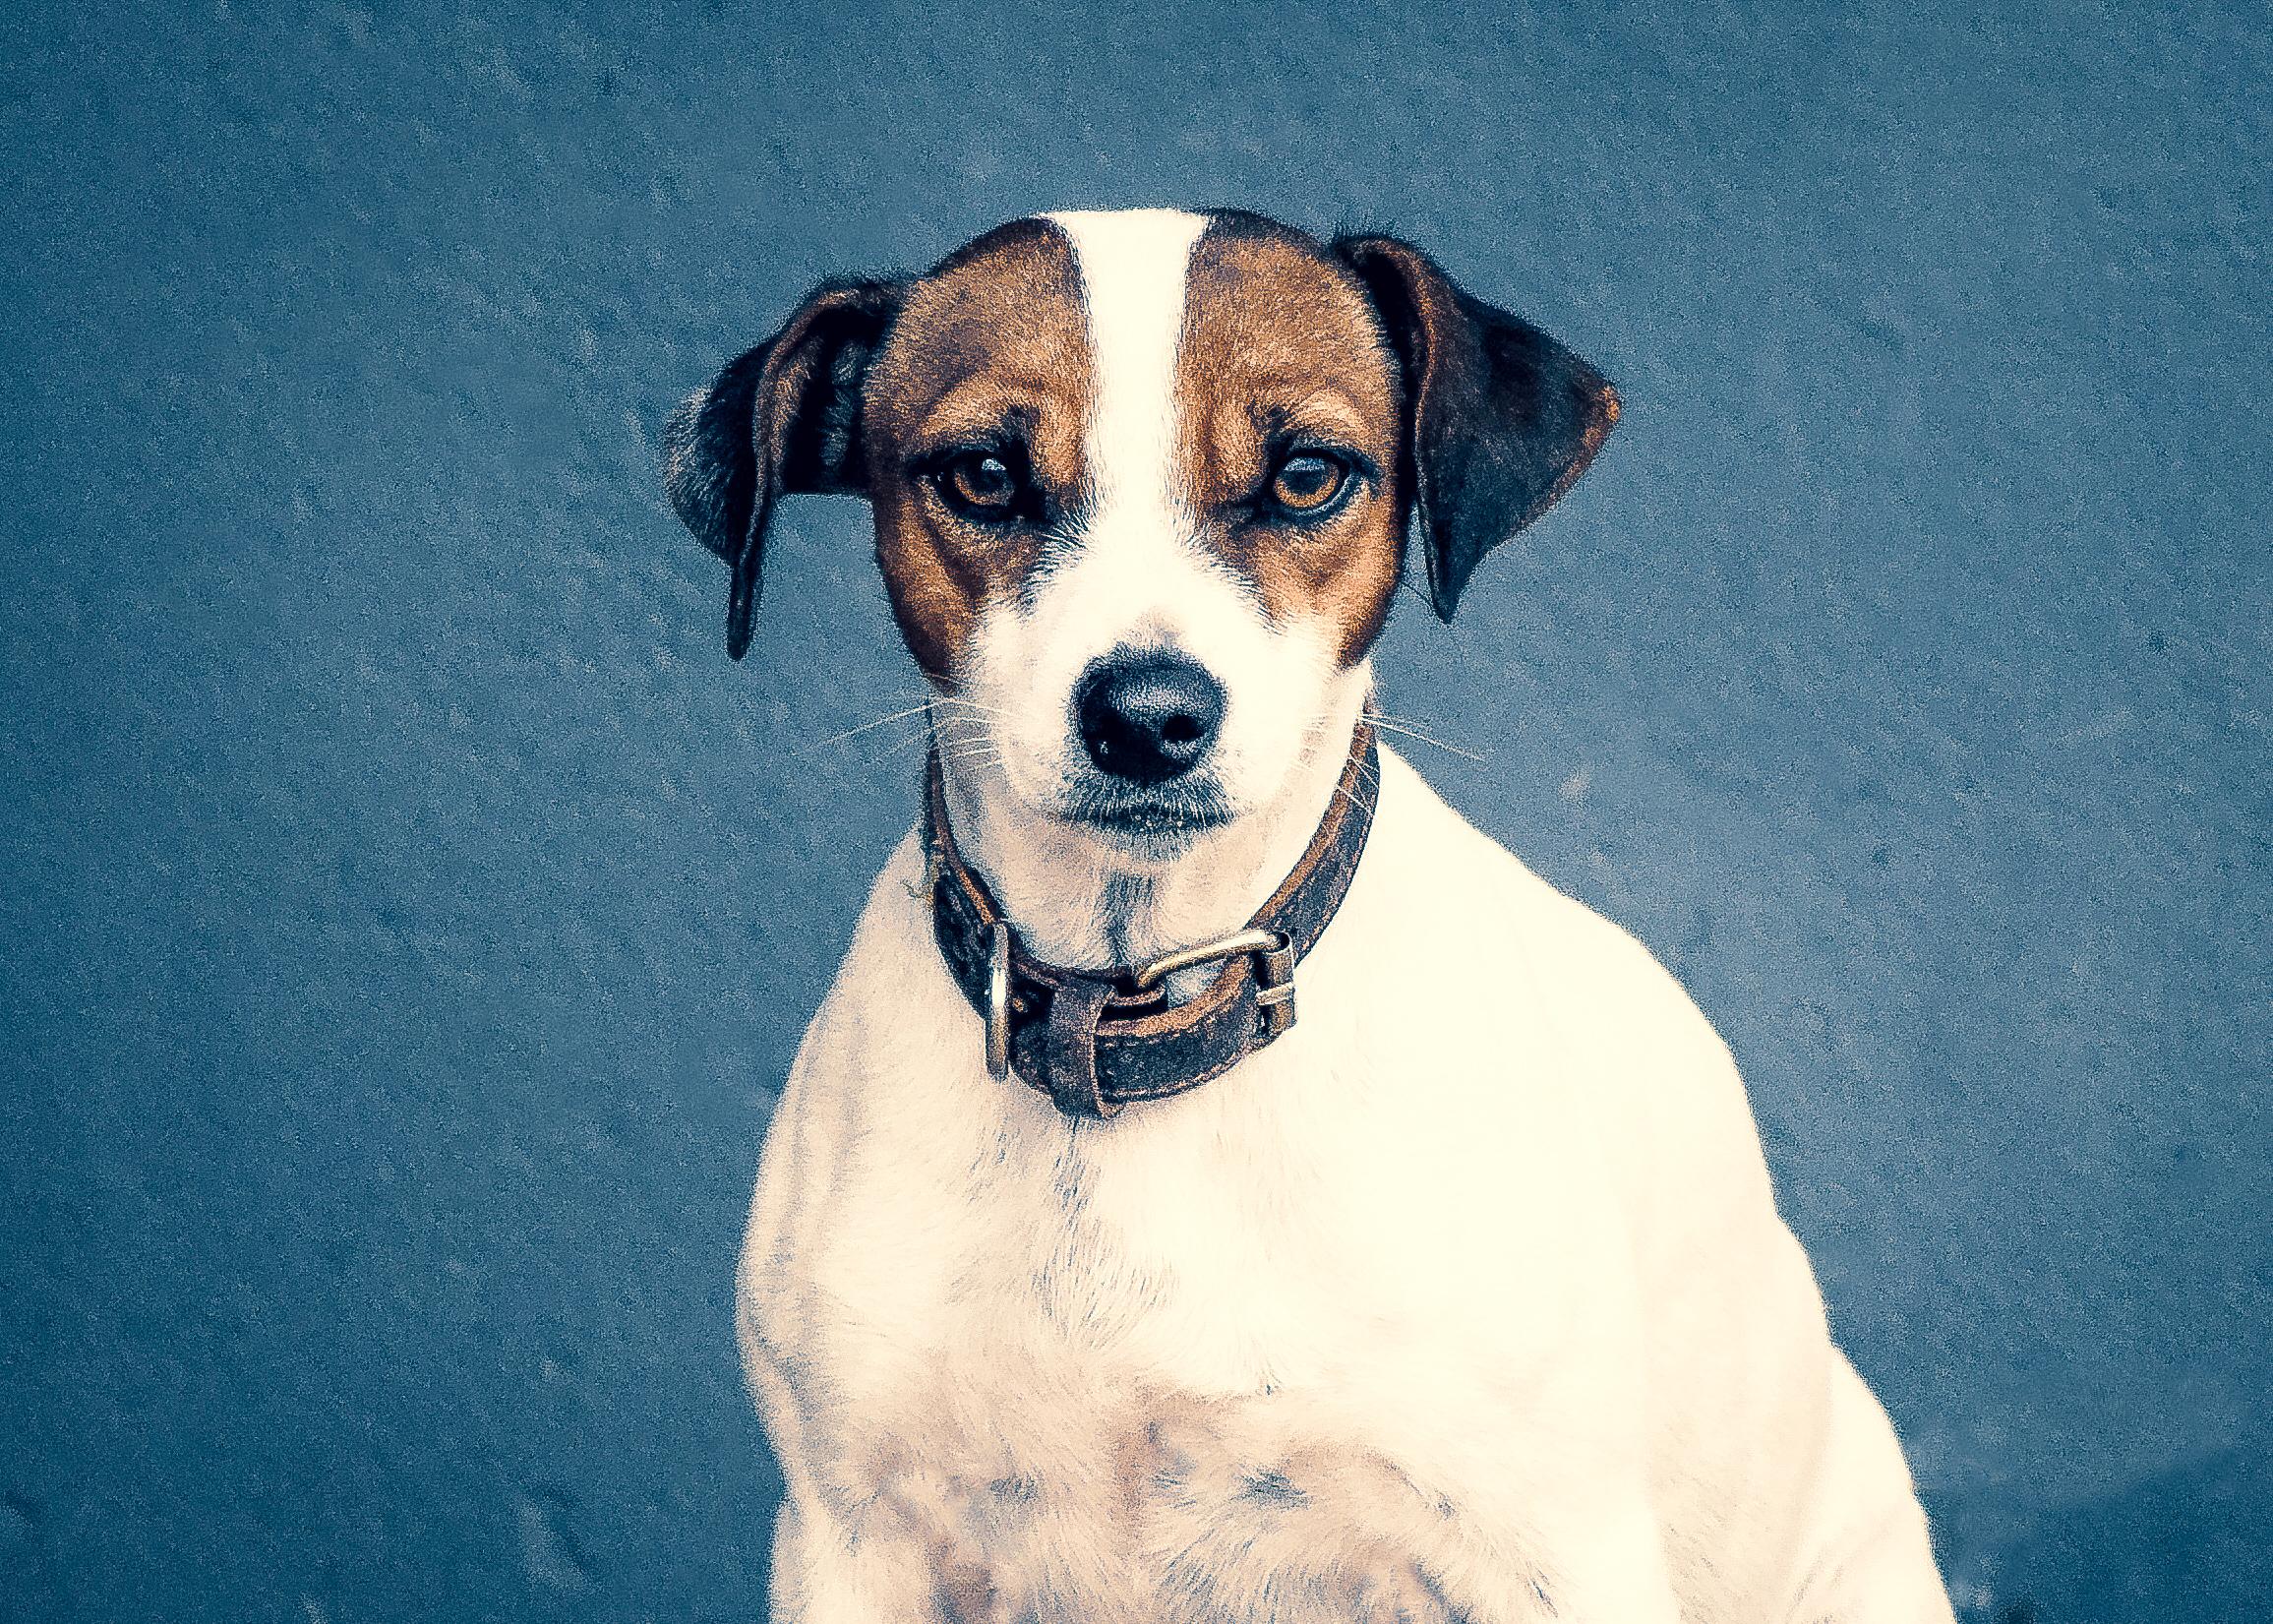 Dog Photography - Bodeguero - Spanish Fox Terrier